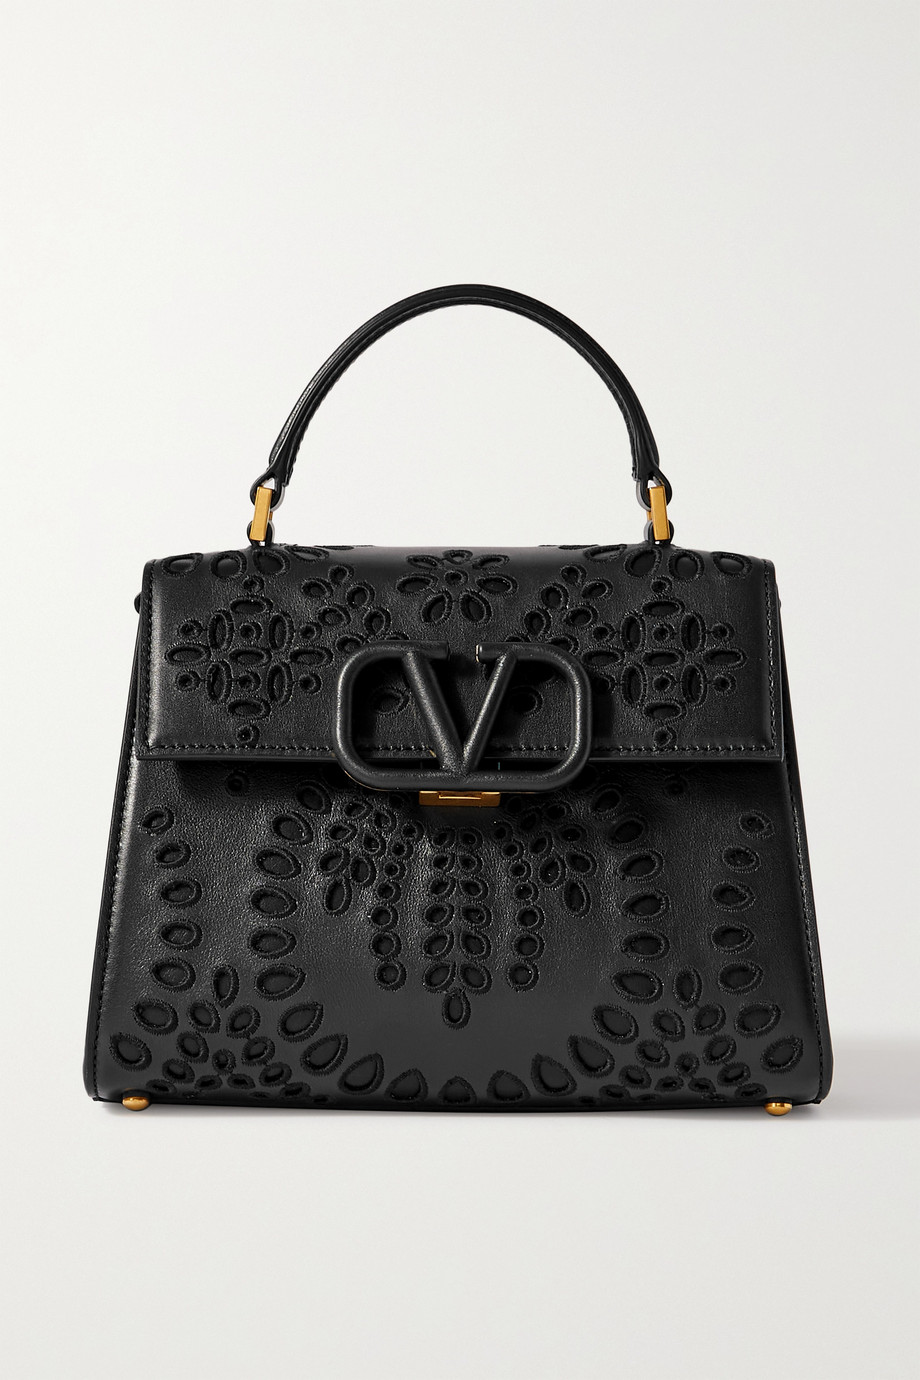 Valentino Sac en broderie anglaise de cuir VSLING Valentino Garavani